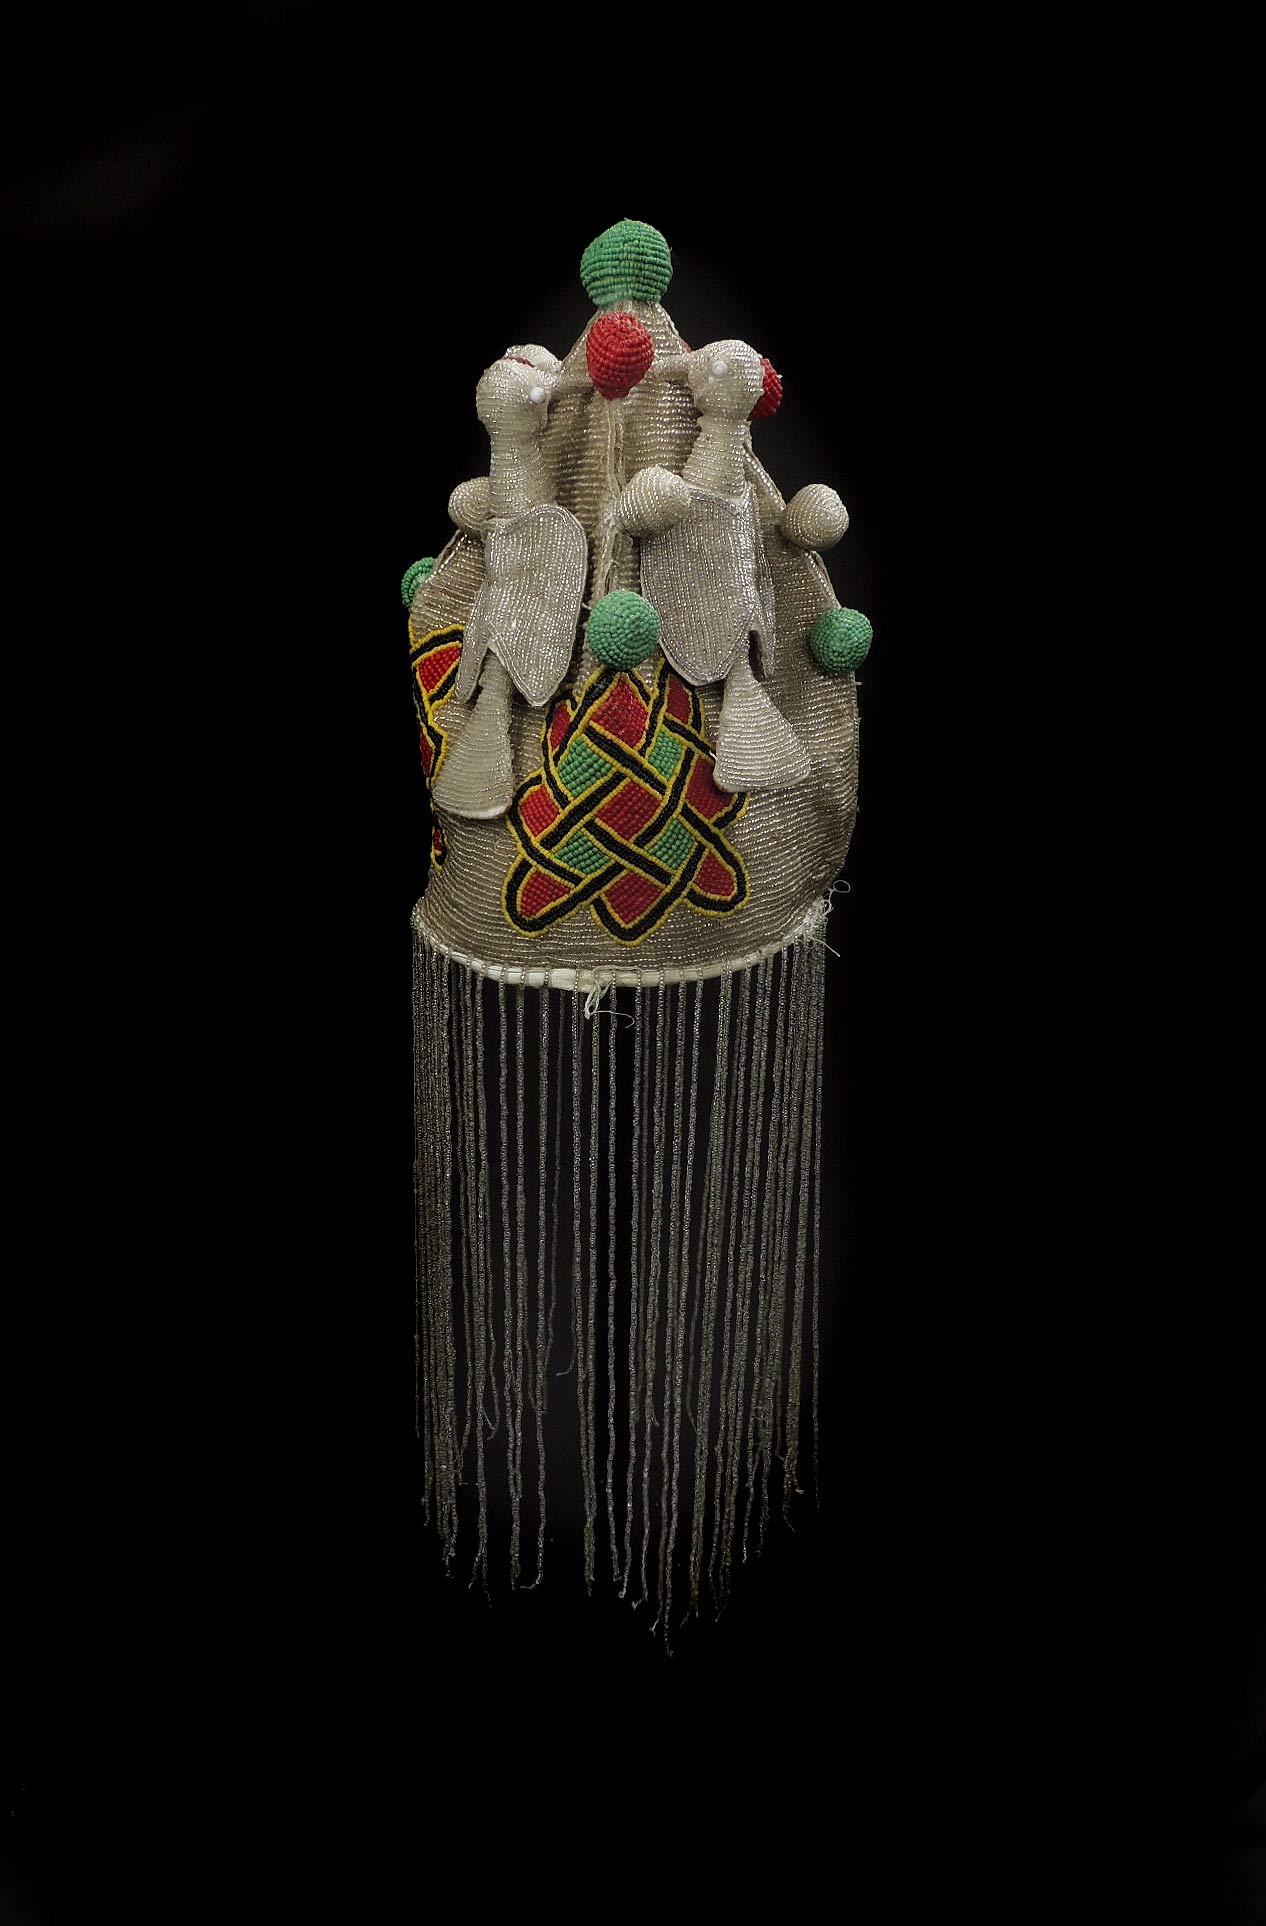 Yoruba Beaded Crown Nigeria African Art - Yoruba - African Beadwork